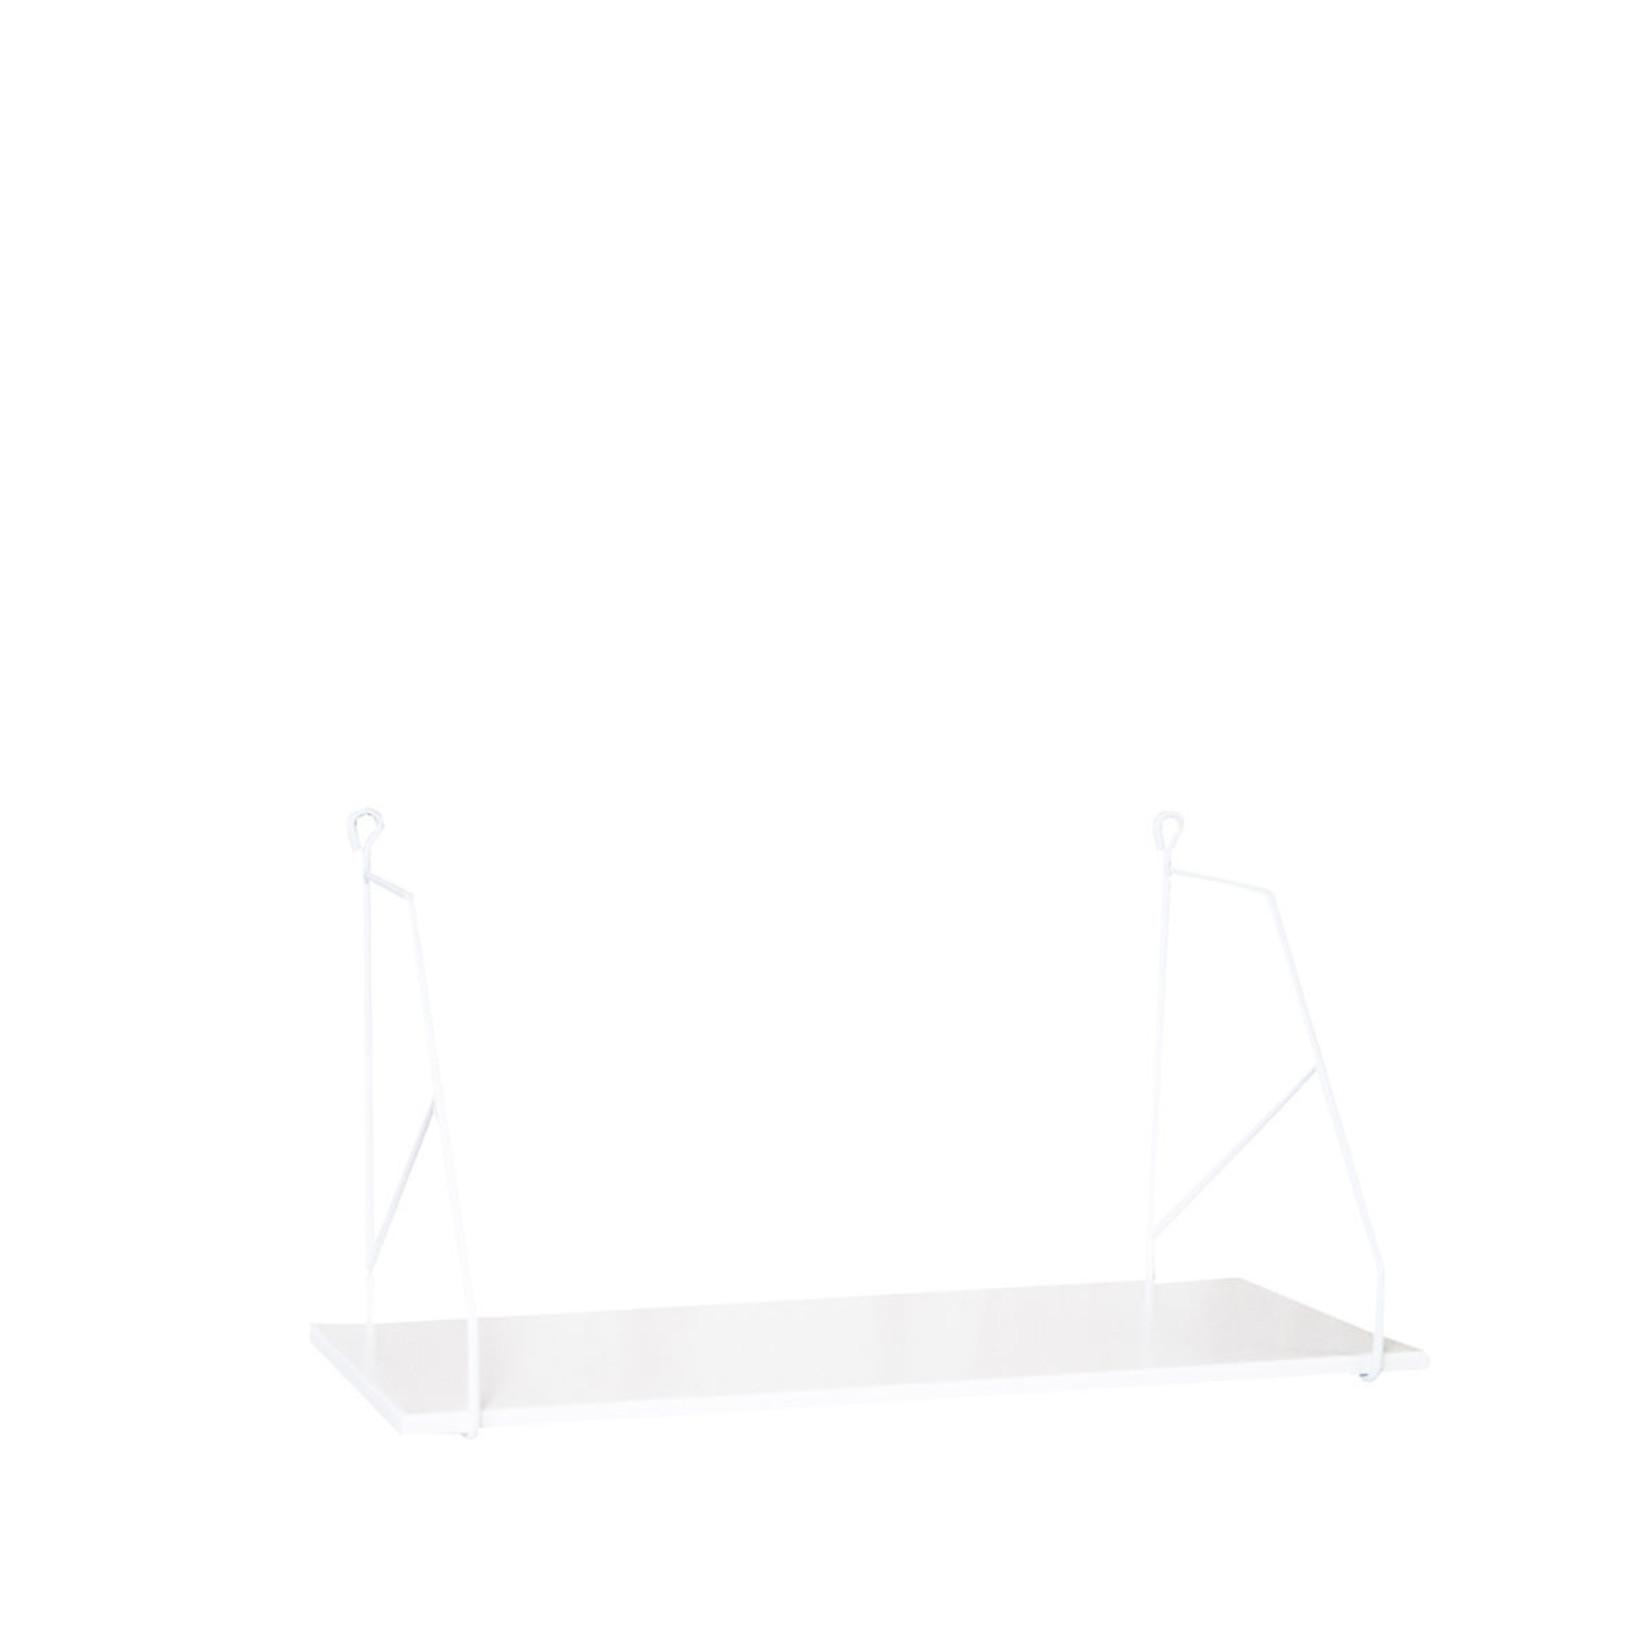 Storefactory  Regal Halltorp Mini